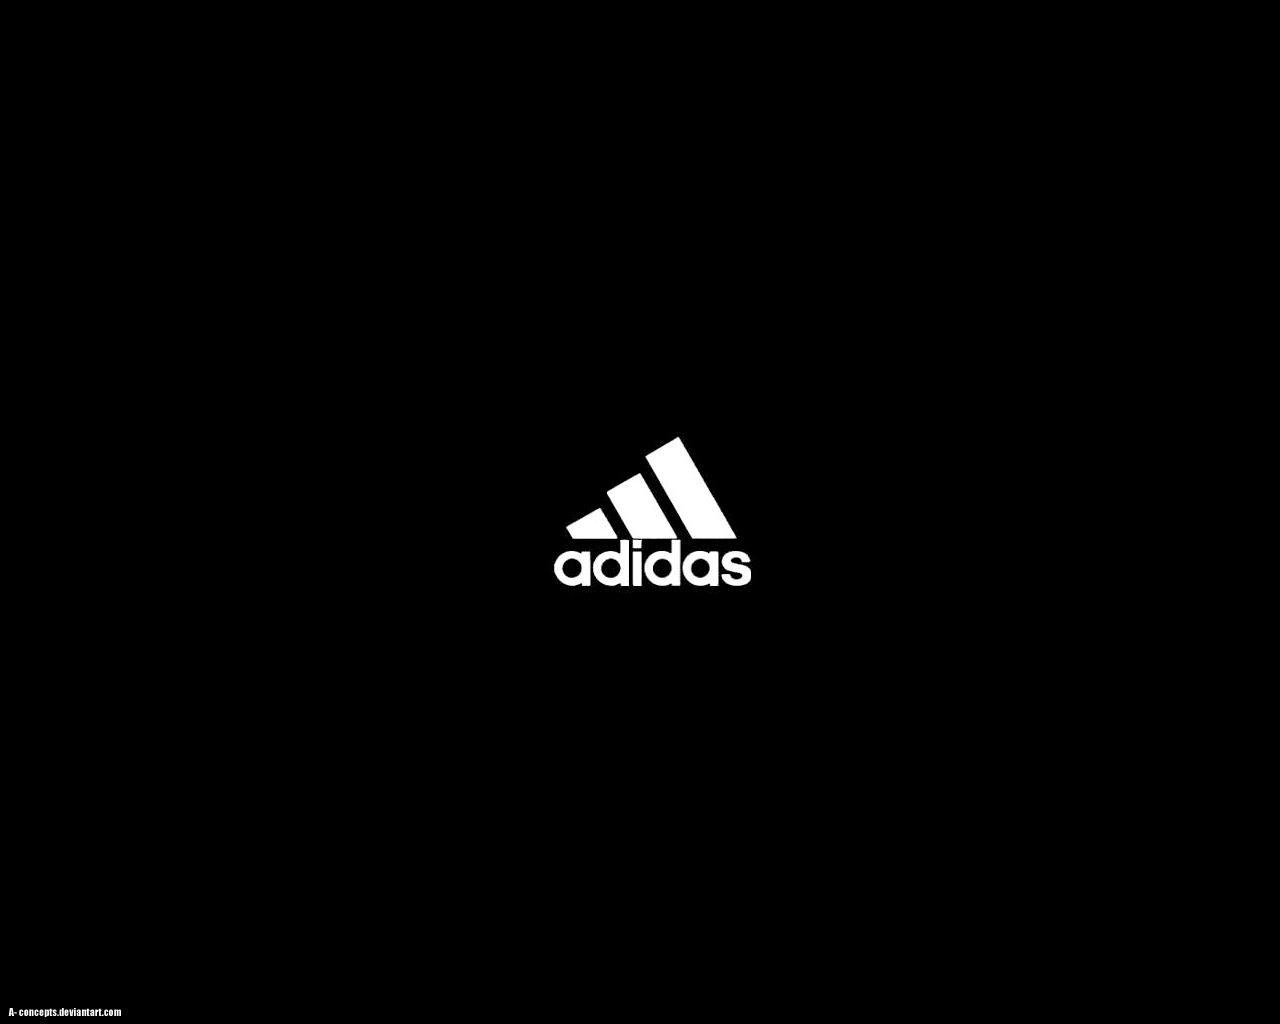 f87106a664c Logo Wallpaper: Logo Adidas Vector Adidas logo black n39; white by